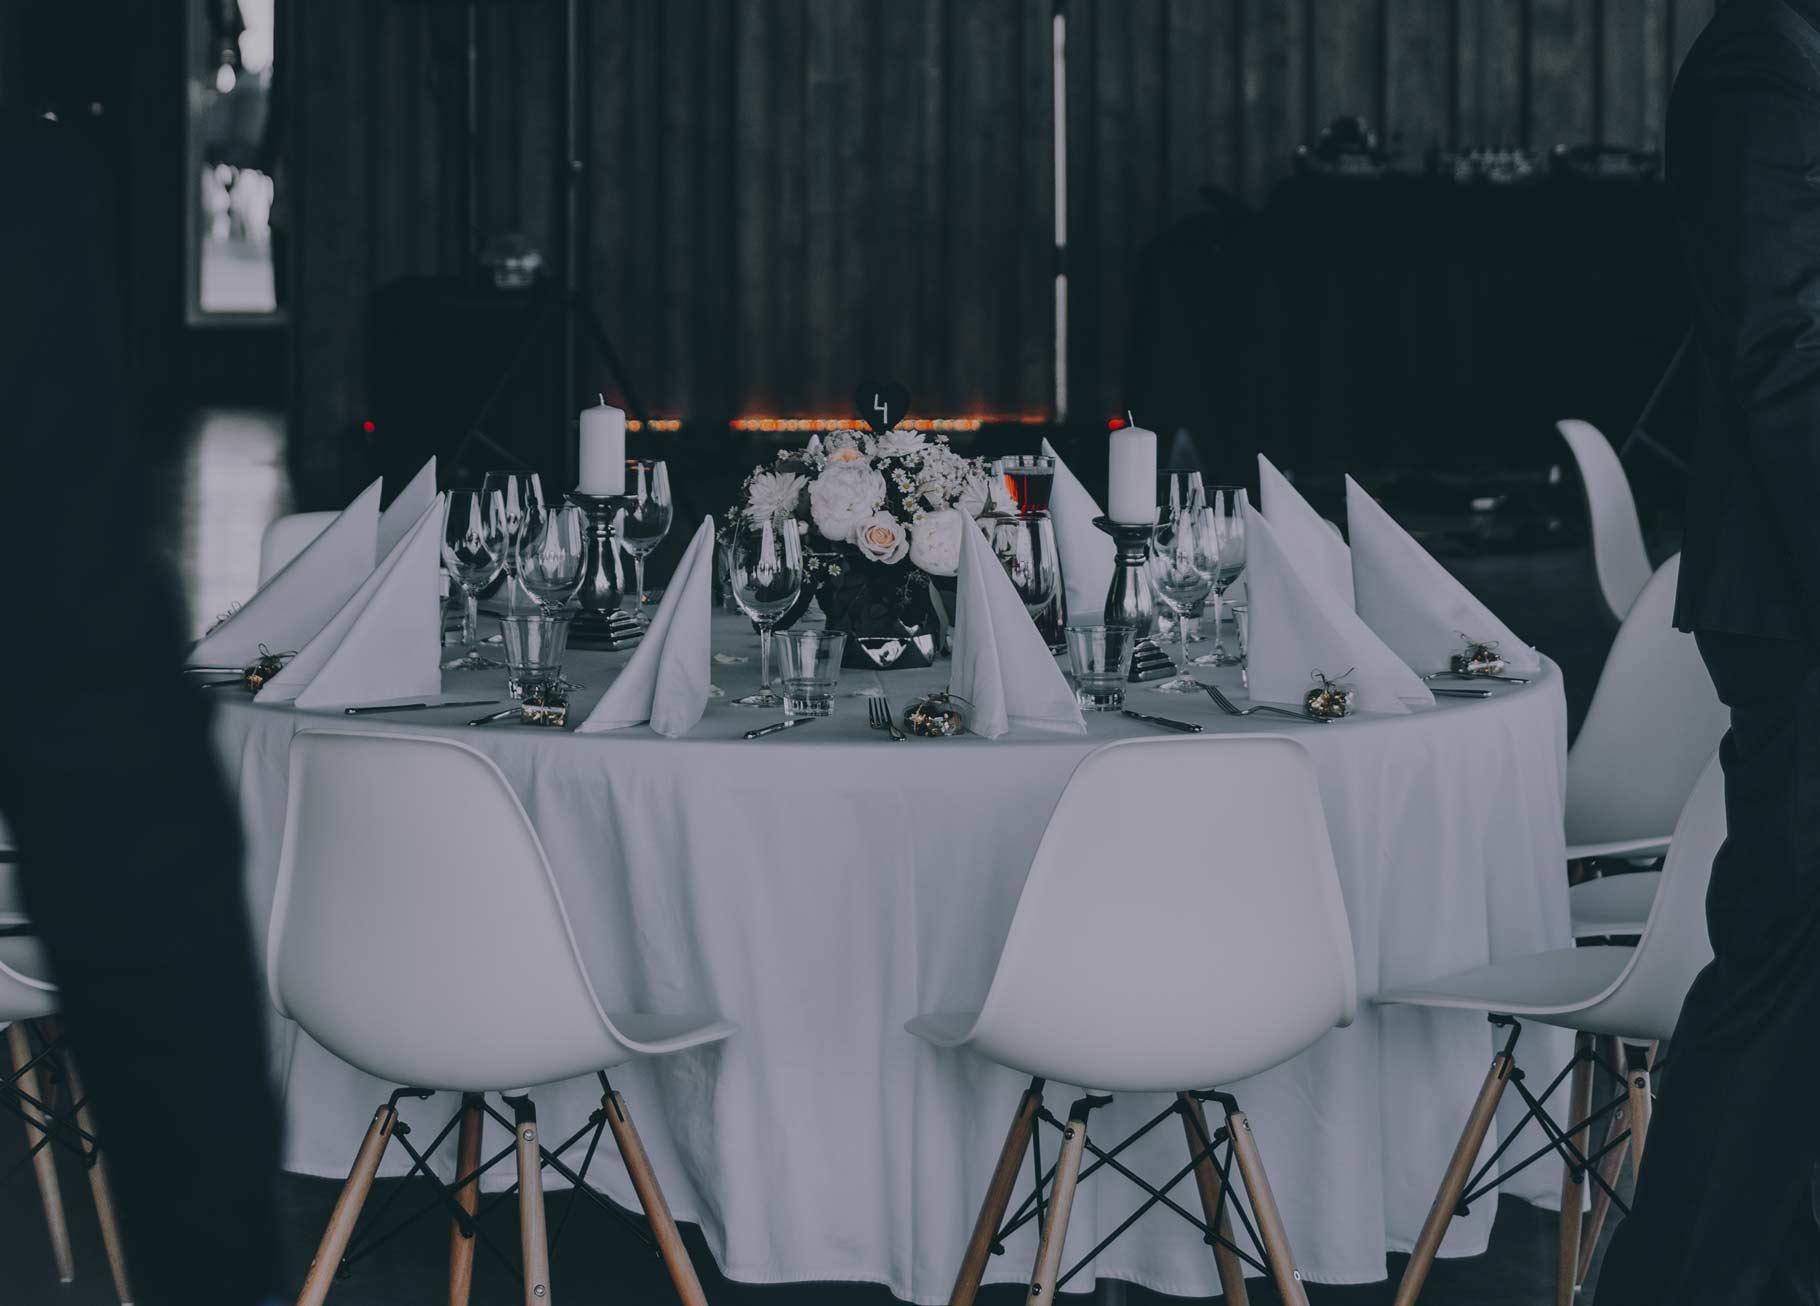 Event Catering Dekoration